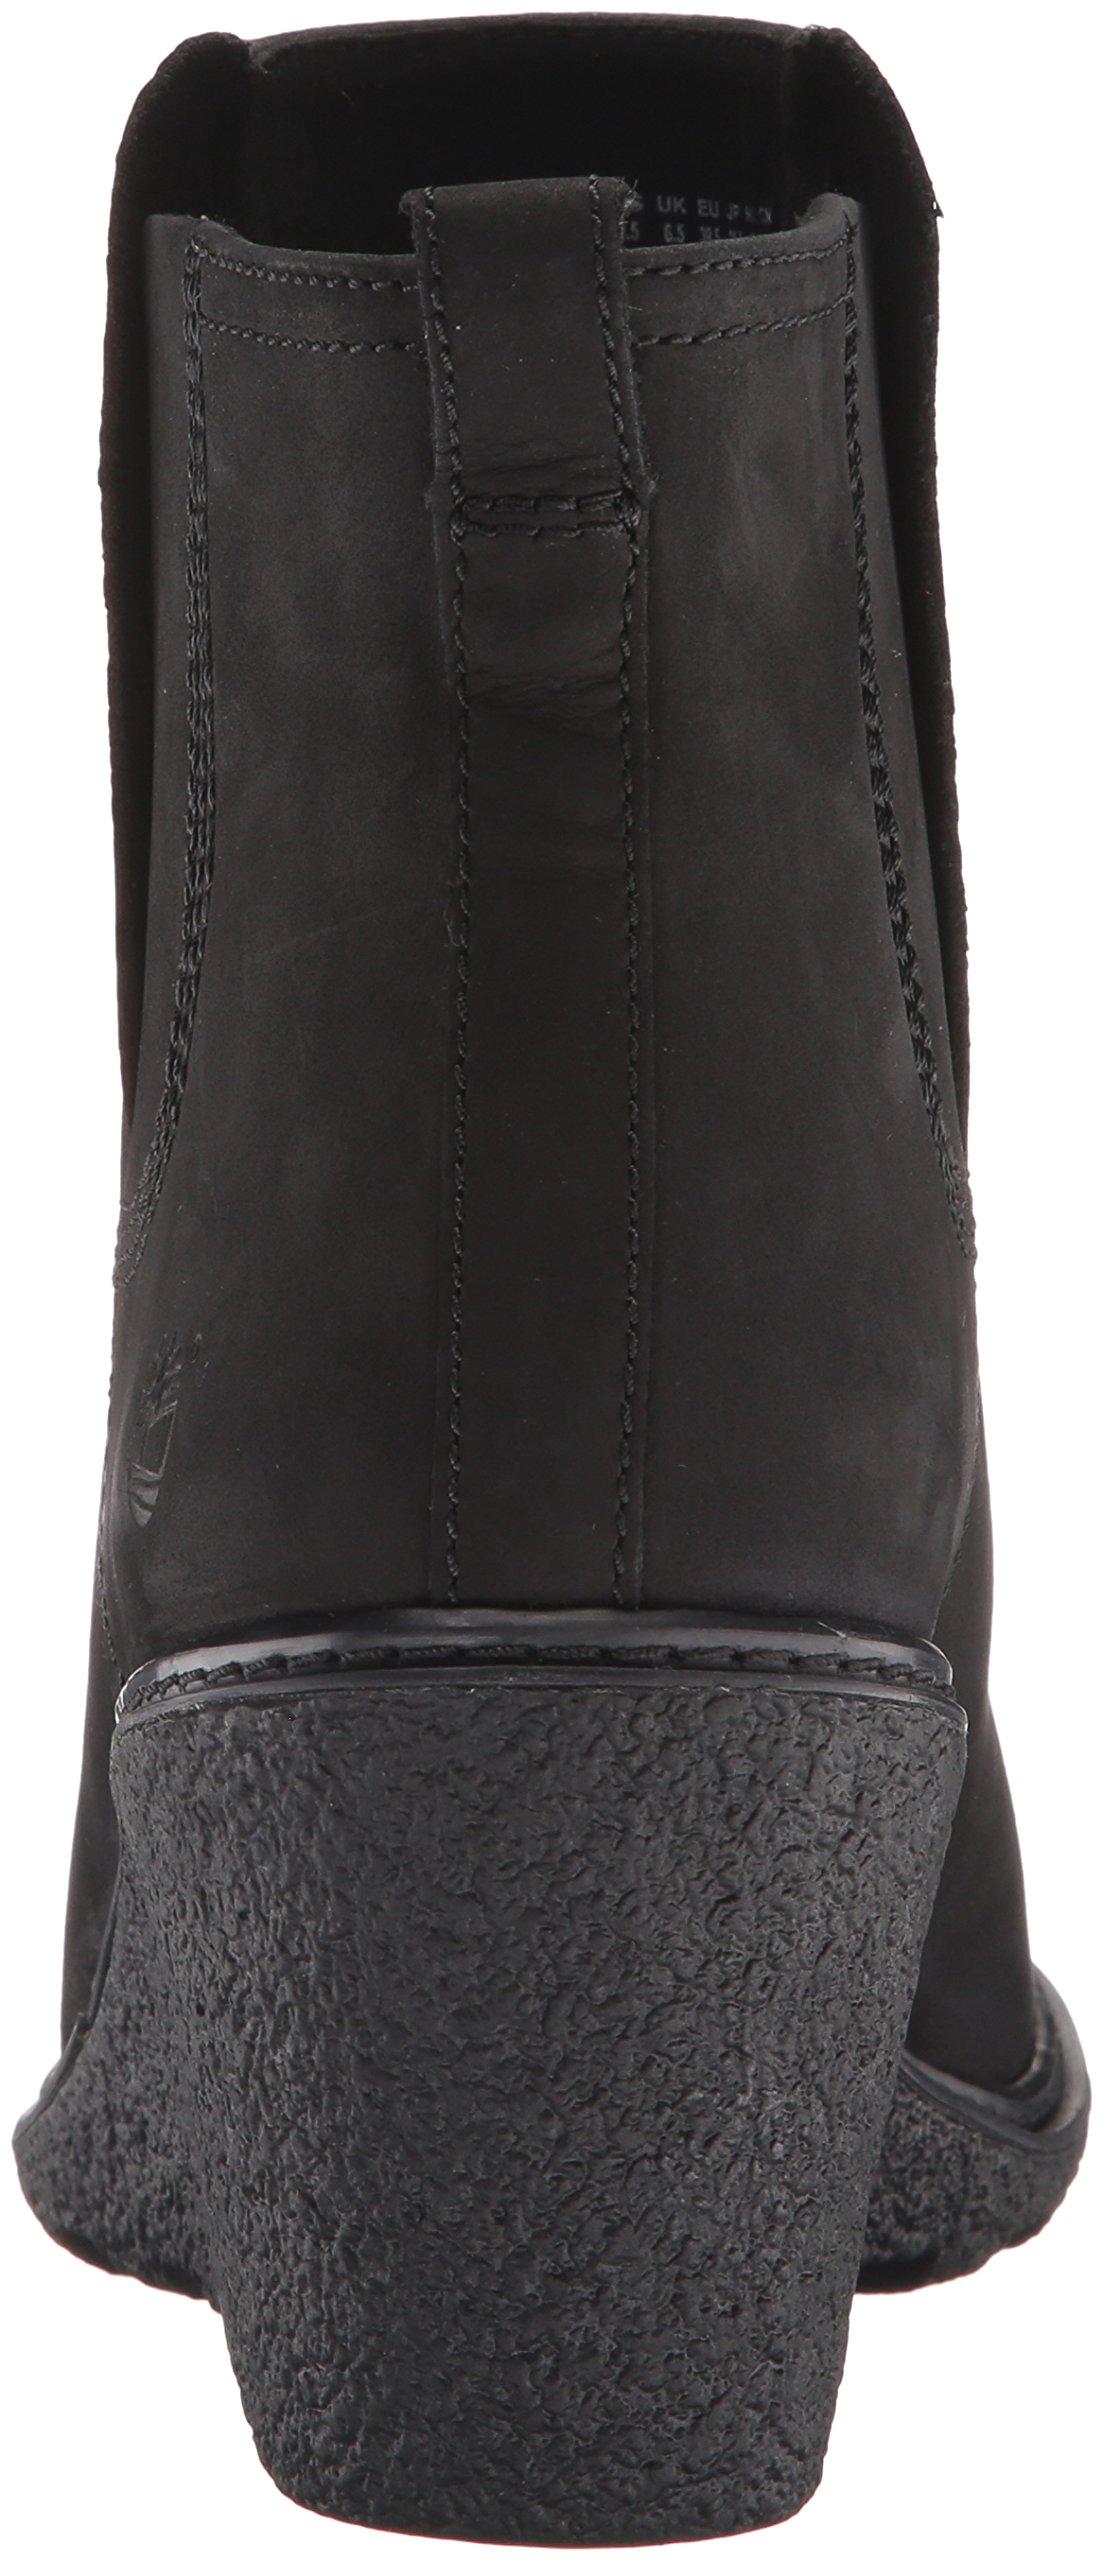 Timberland Women's Amston Chelsea Boot,Black Nubuck,9 M US by Timberland (Image #2)